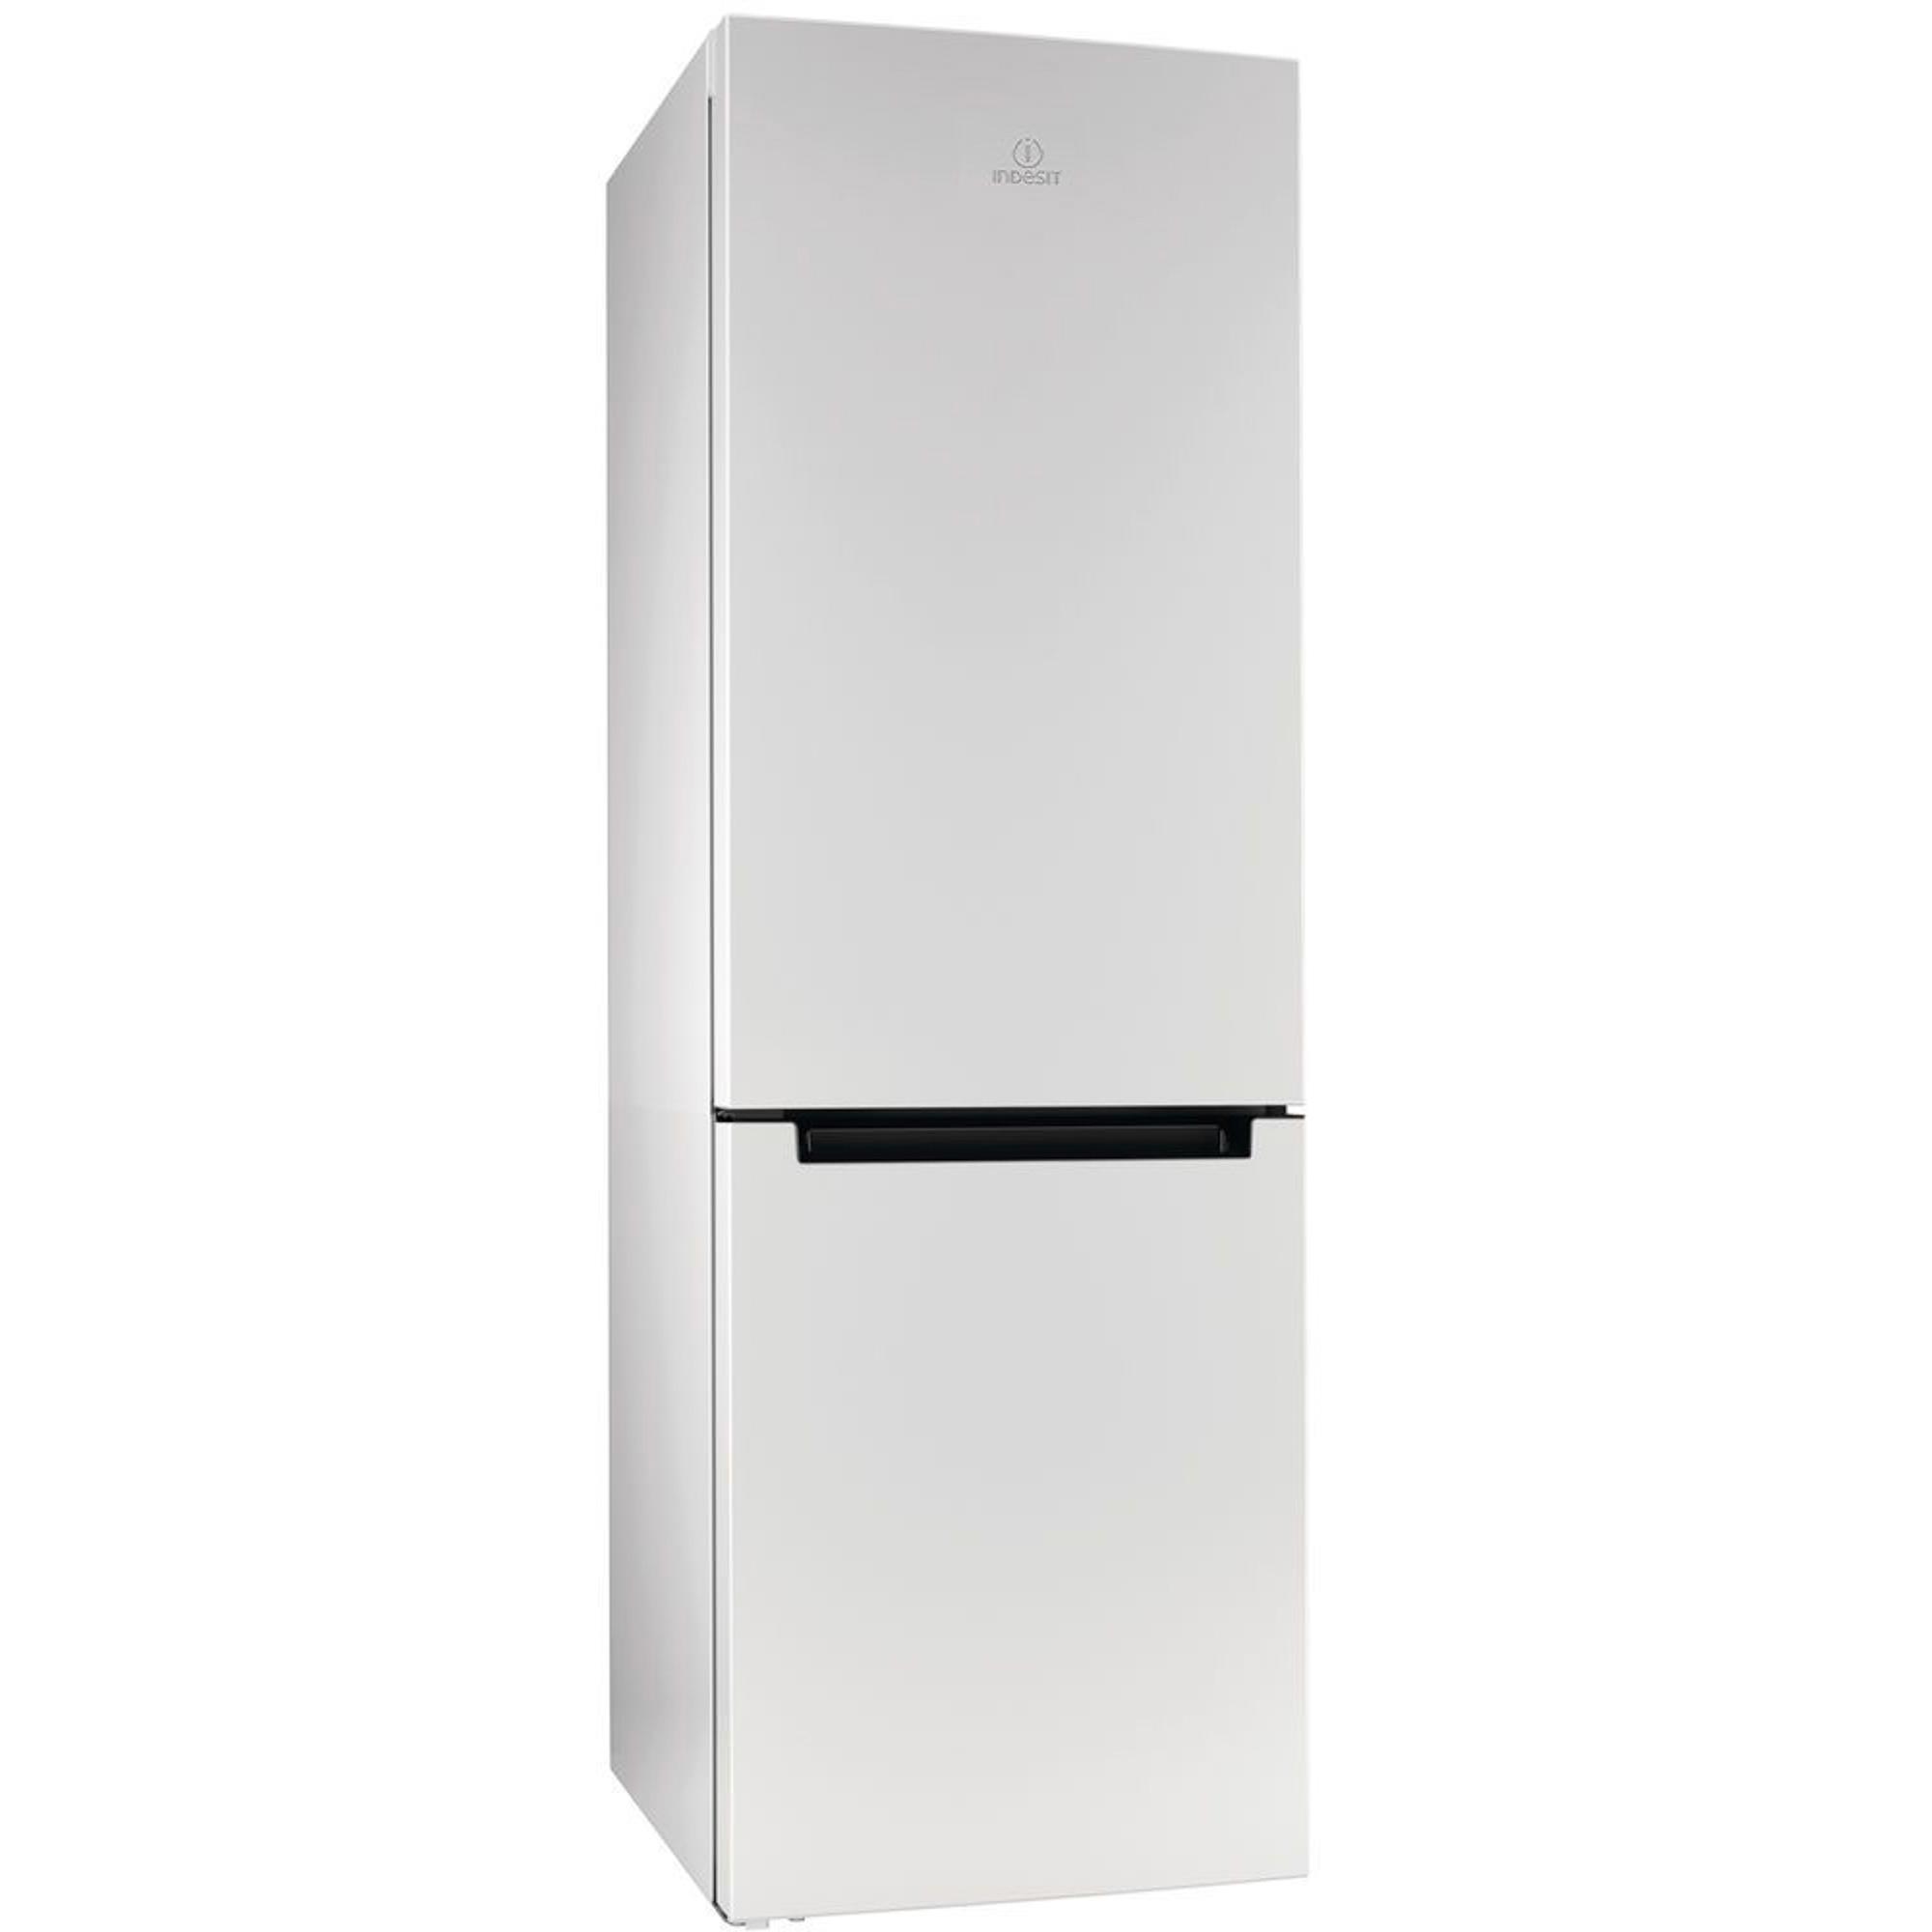 Холодильник Indesit DF 4180 W White фото